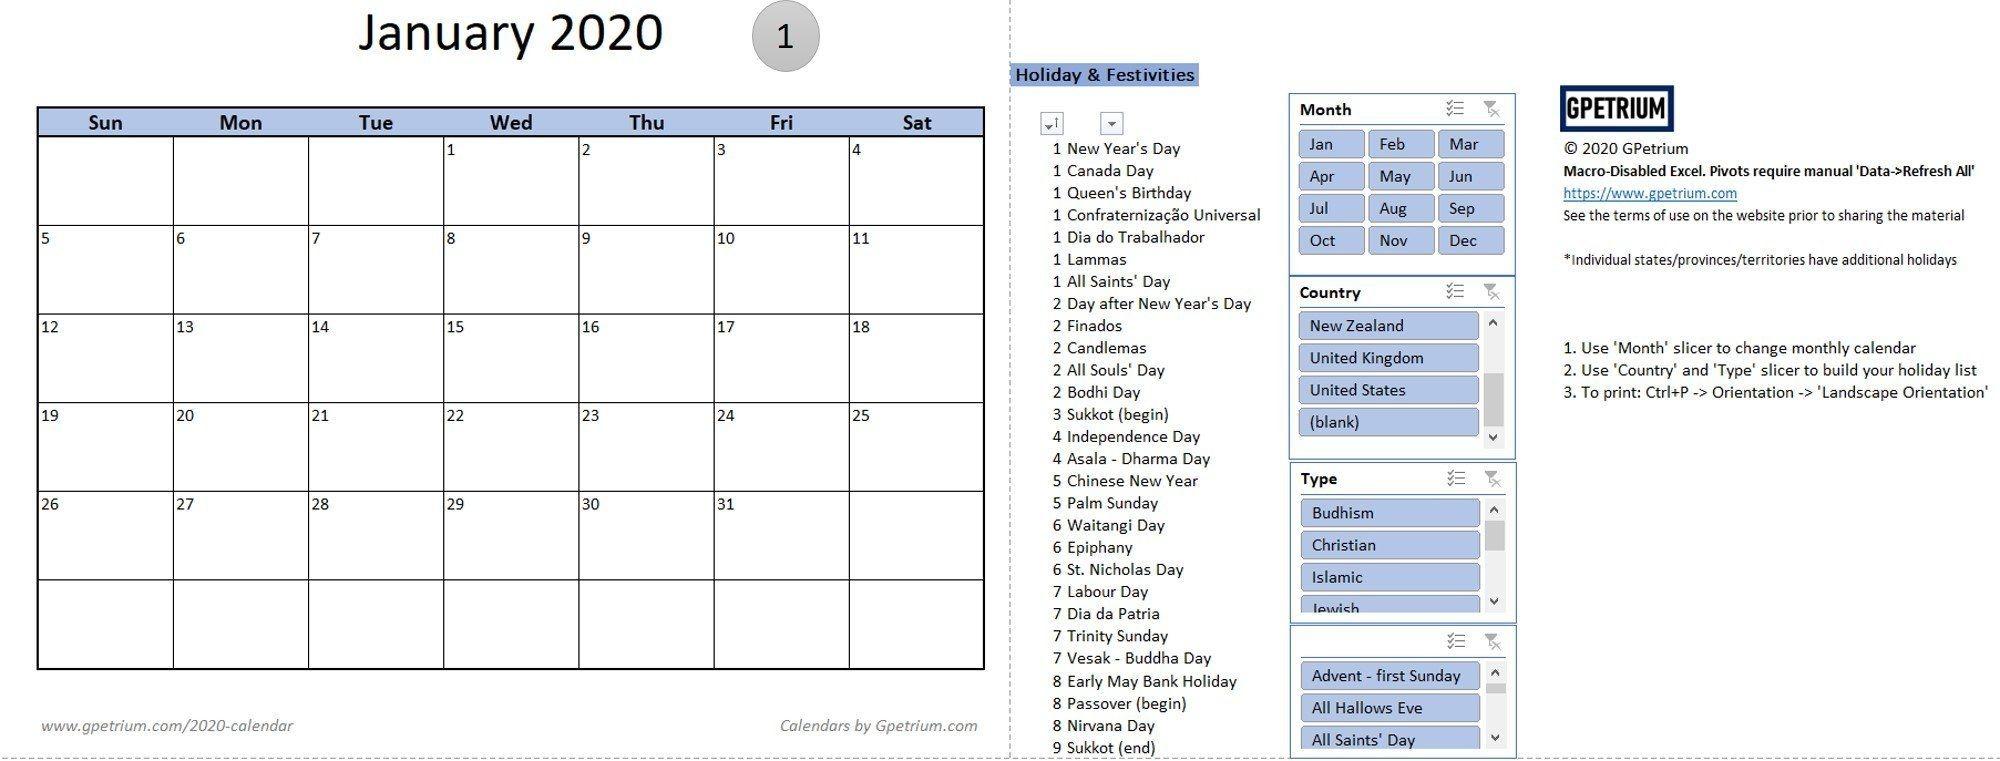 2020 calendar templates – gpetrium